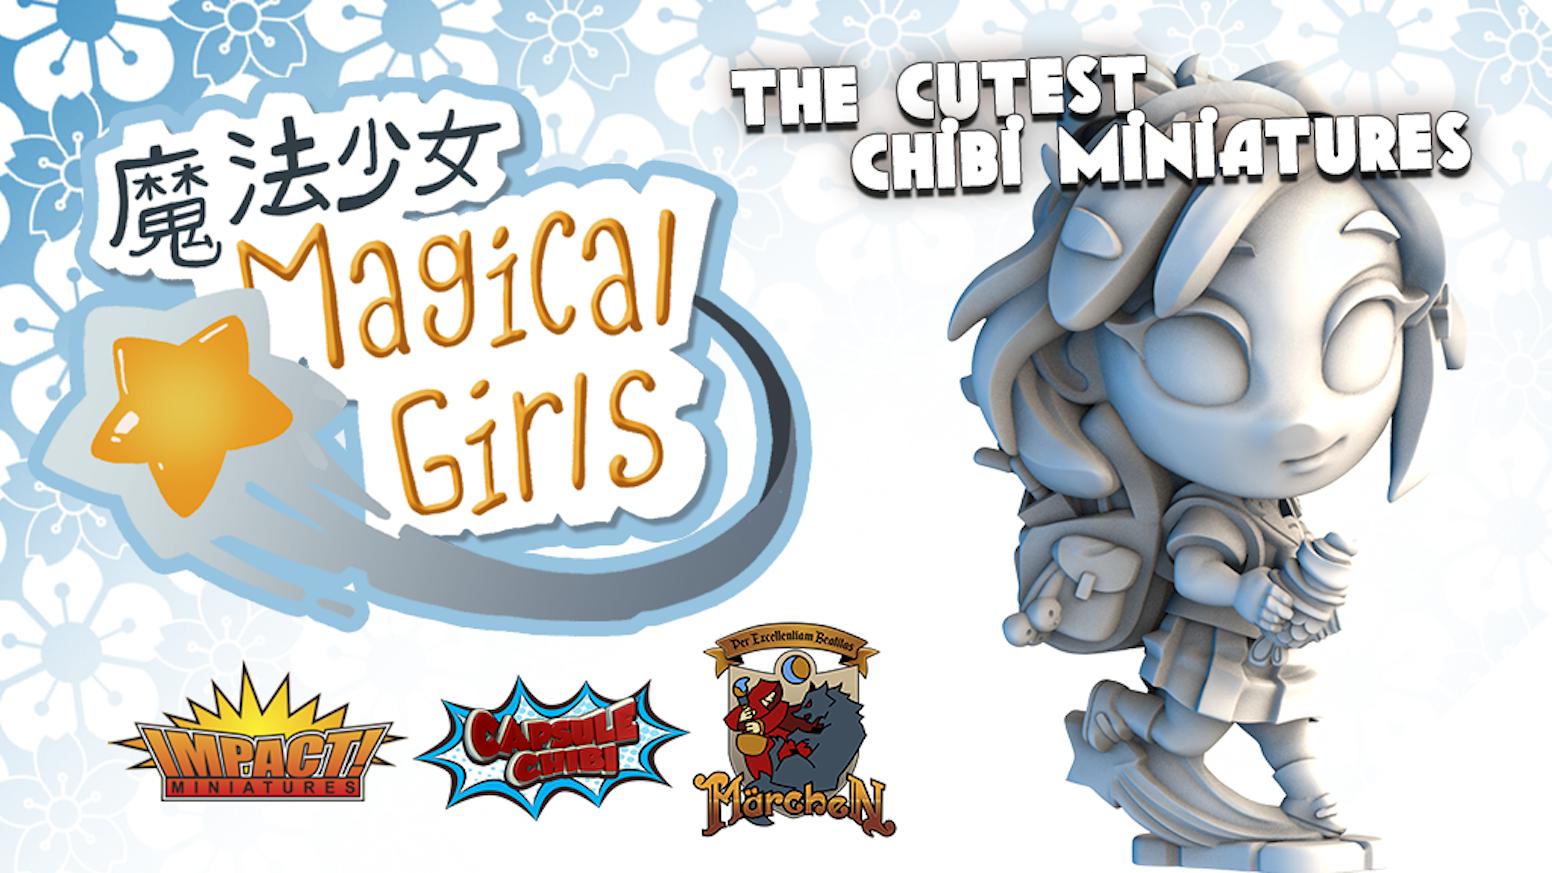 Chibi Capsule Magical Girls & Monsters by Impact! Miniatures